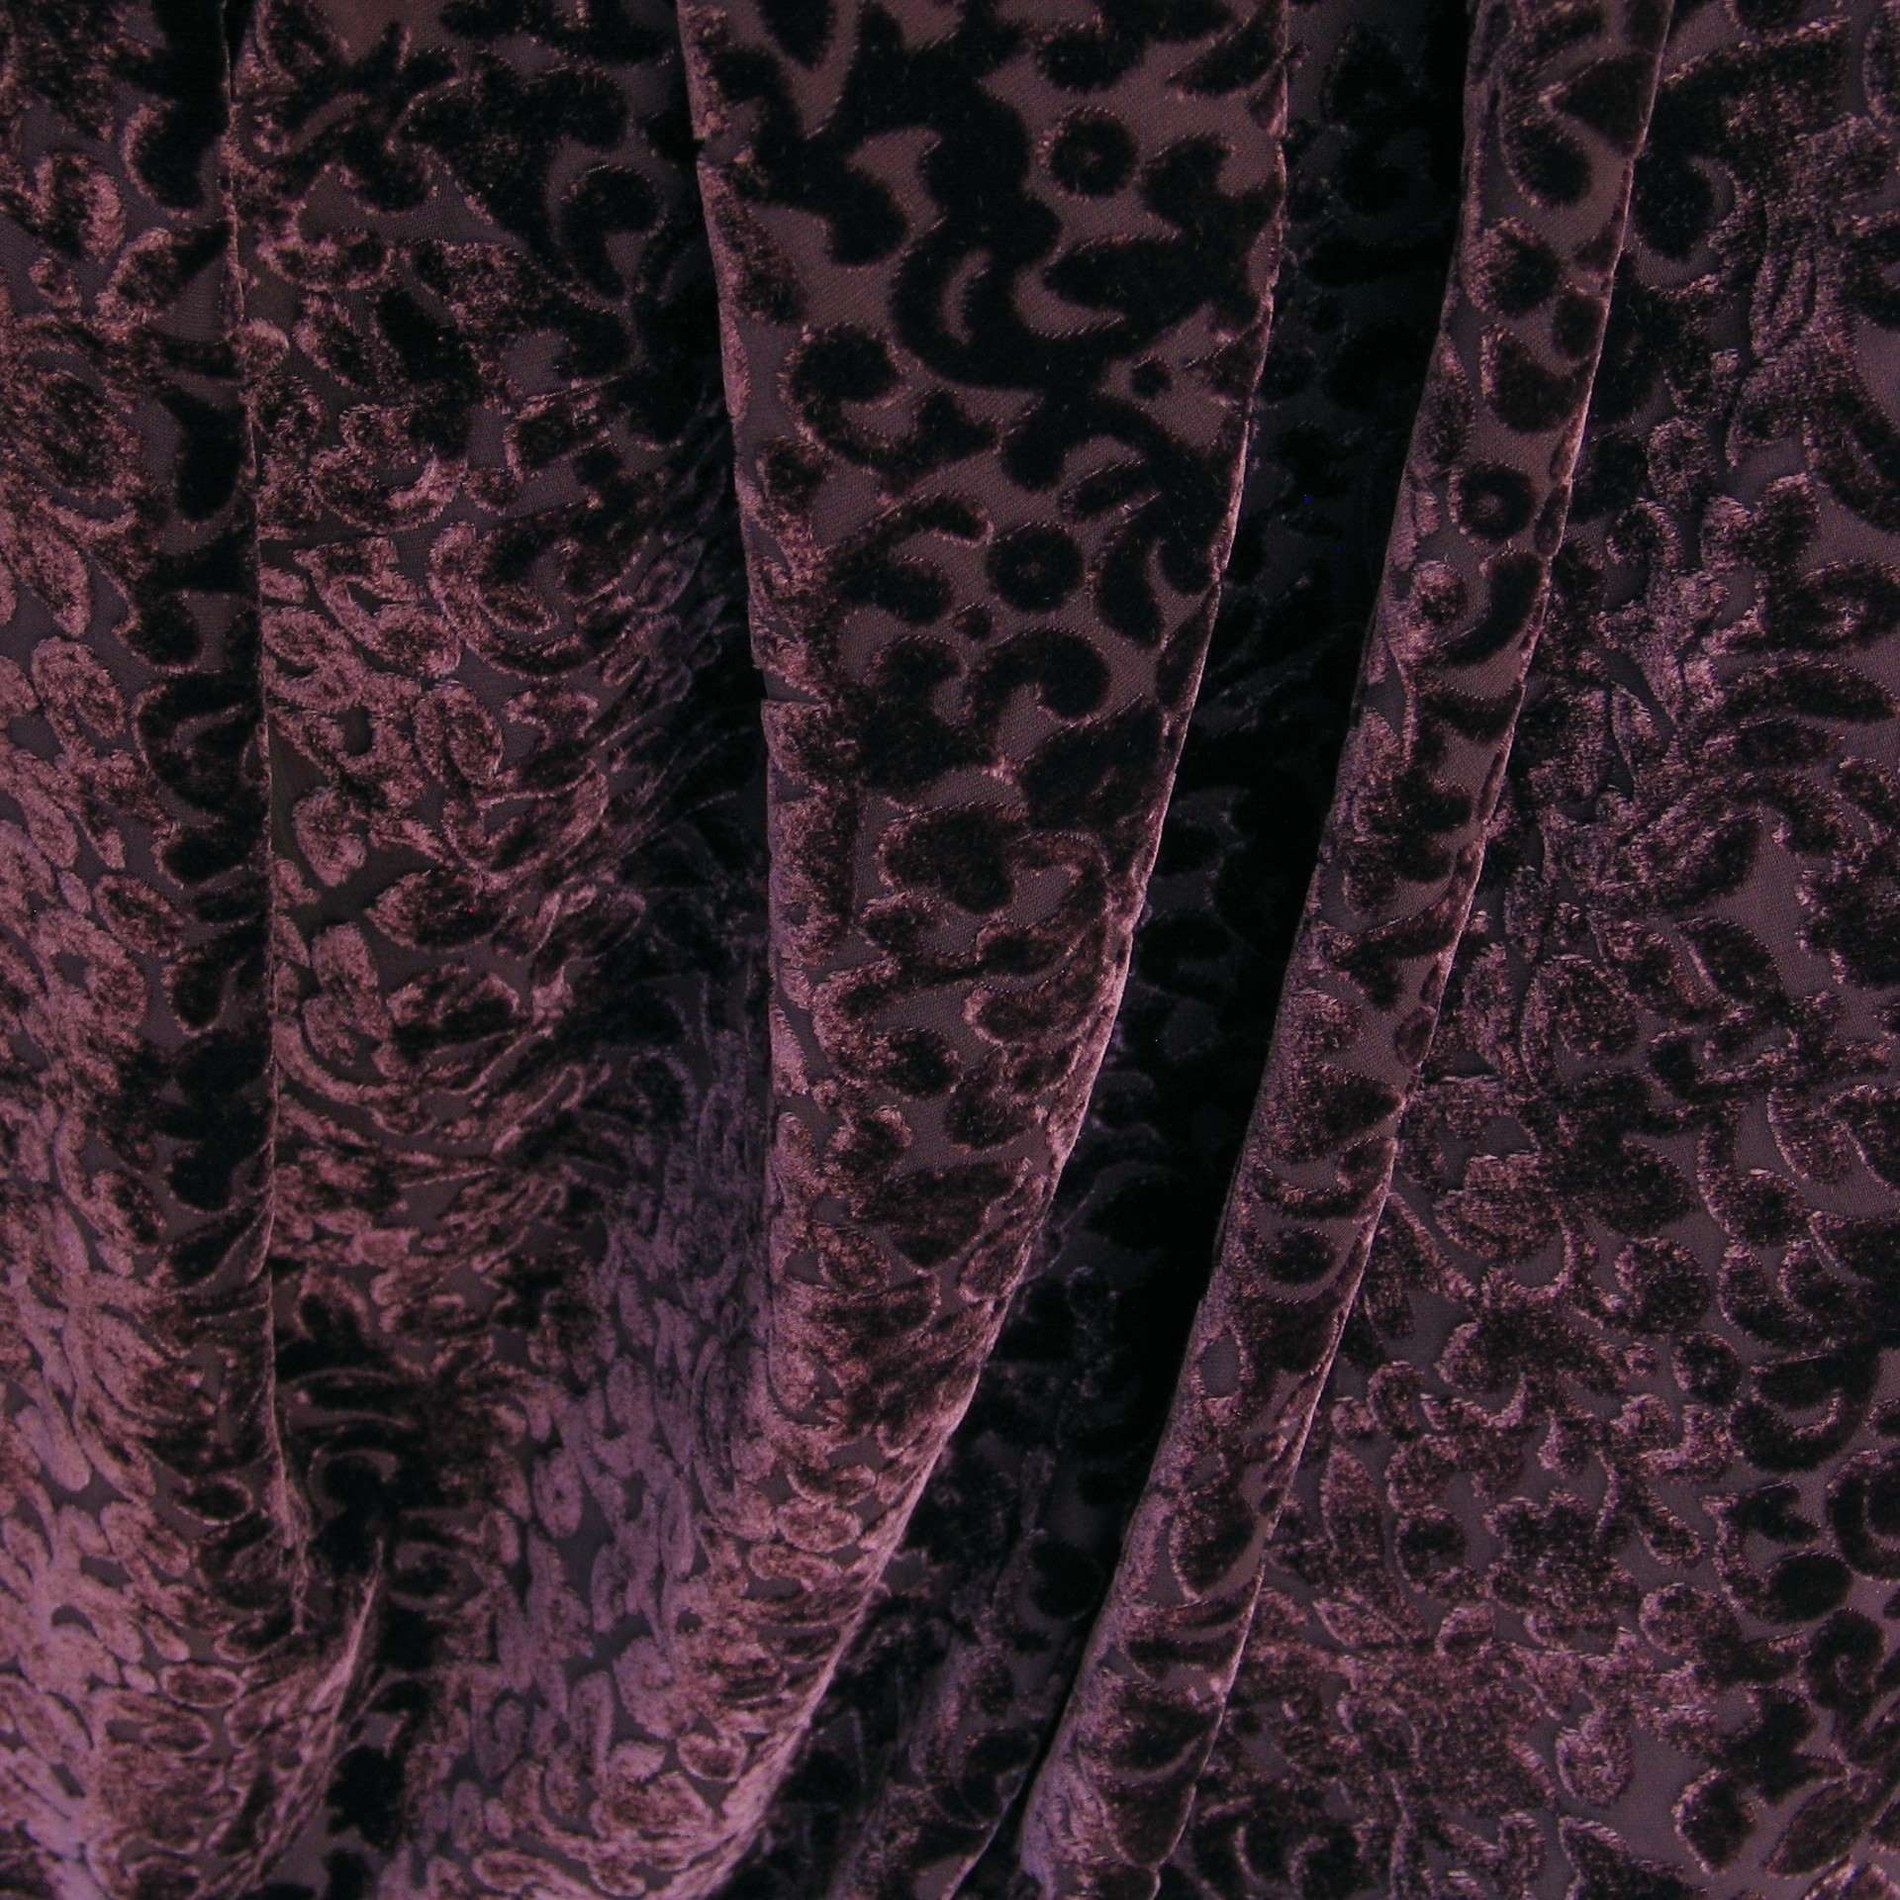 0277 seiden samt ausbrenner beere gemusterte stoffe stoffe mit fantasiemuster. Black Bedroom Furniture Sets. Home Design Ideas